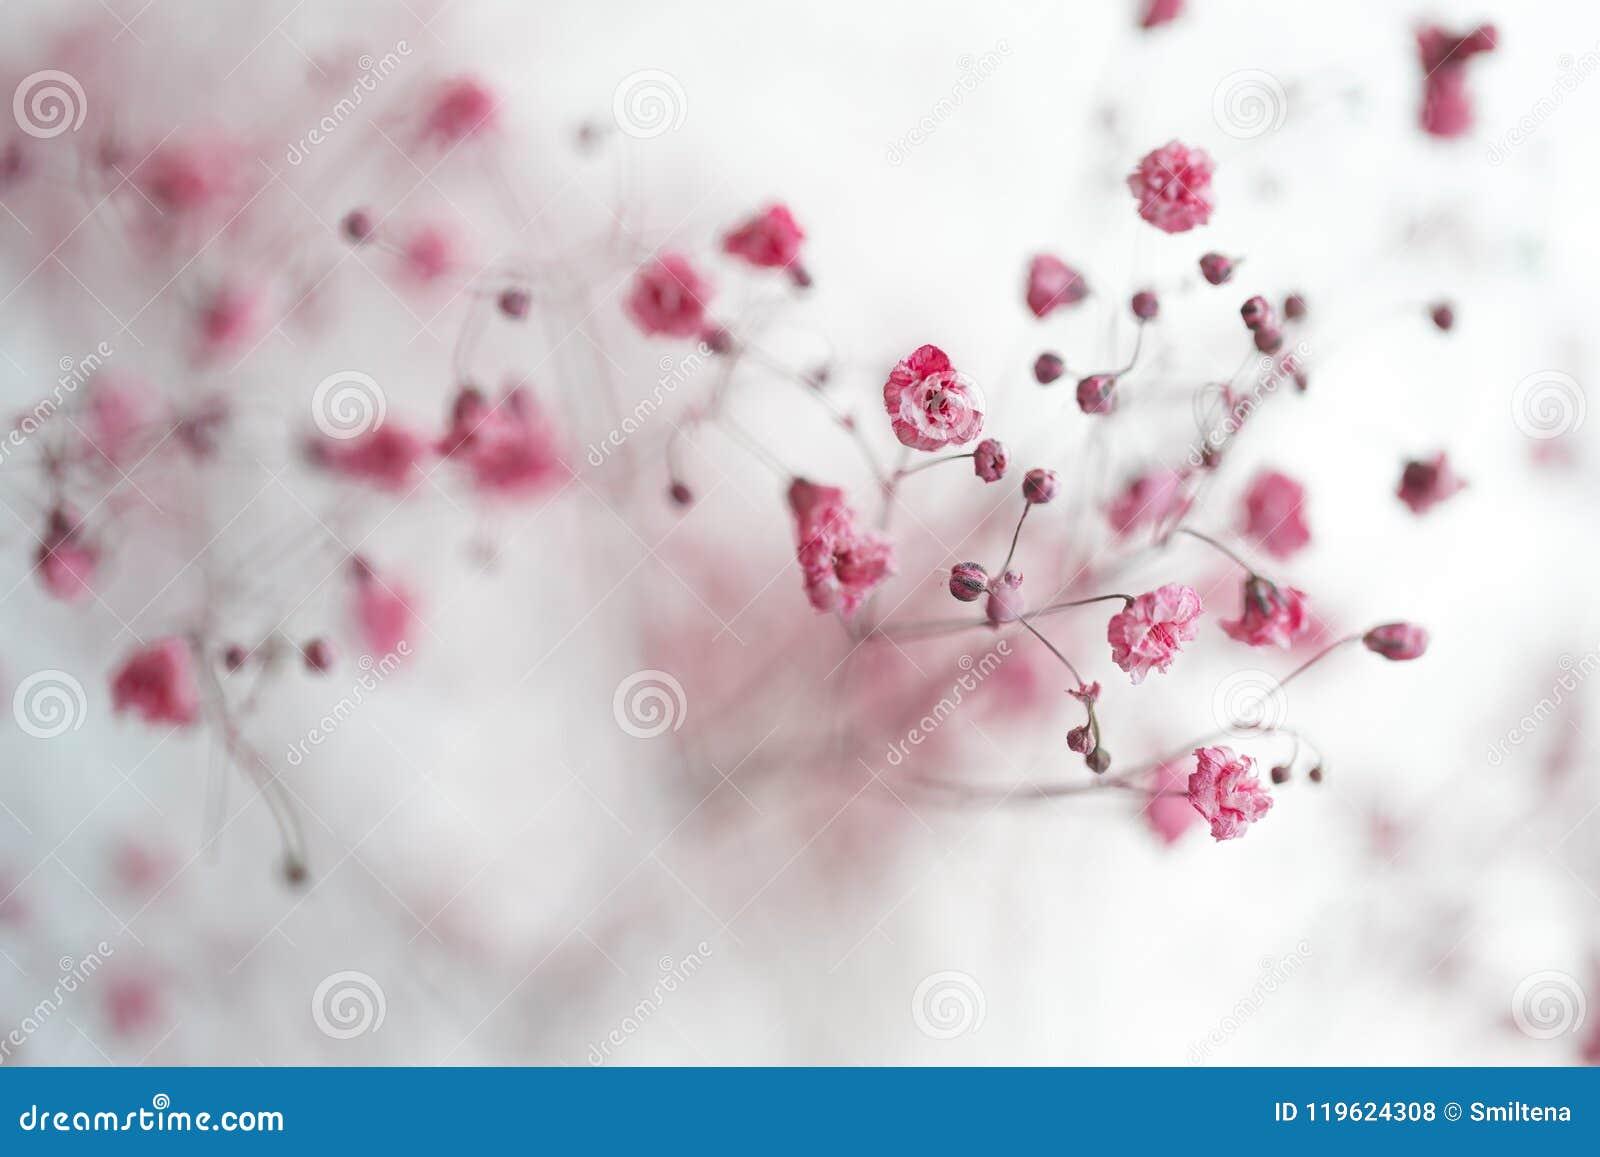 Dry Pink Babys Breath Flowers Stock Photo Image Of Feminine